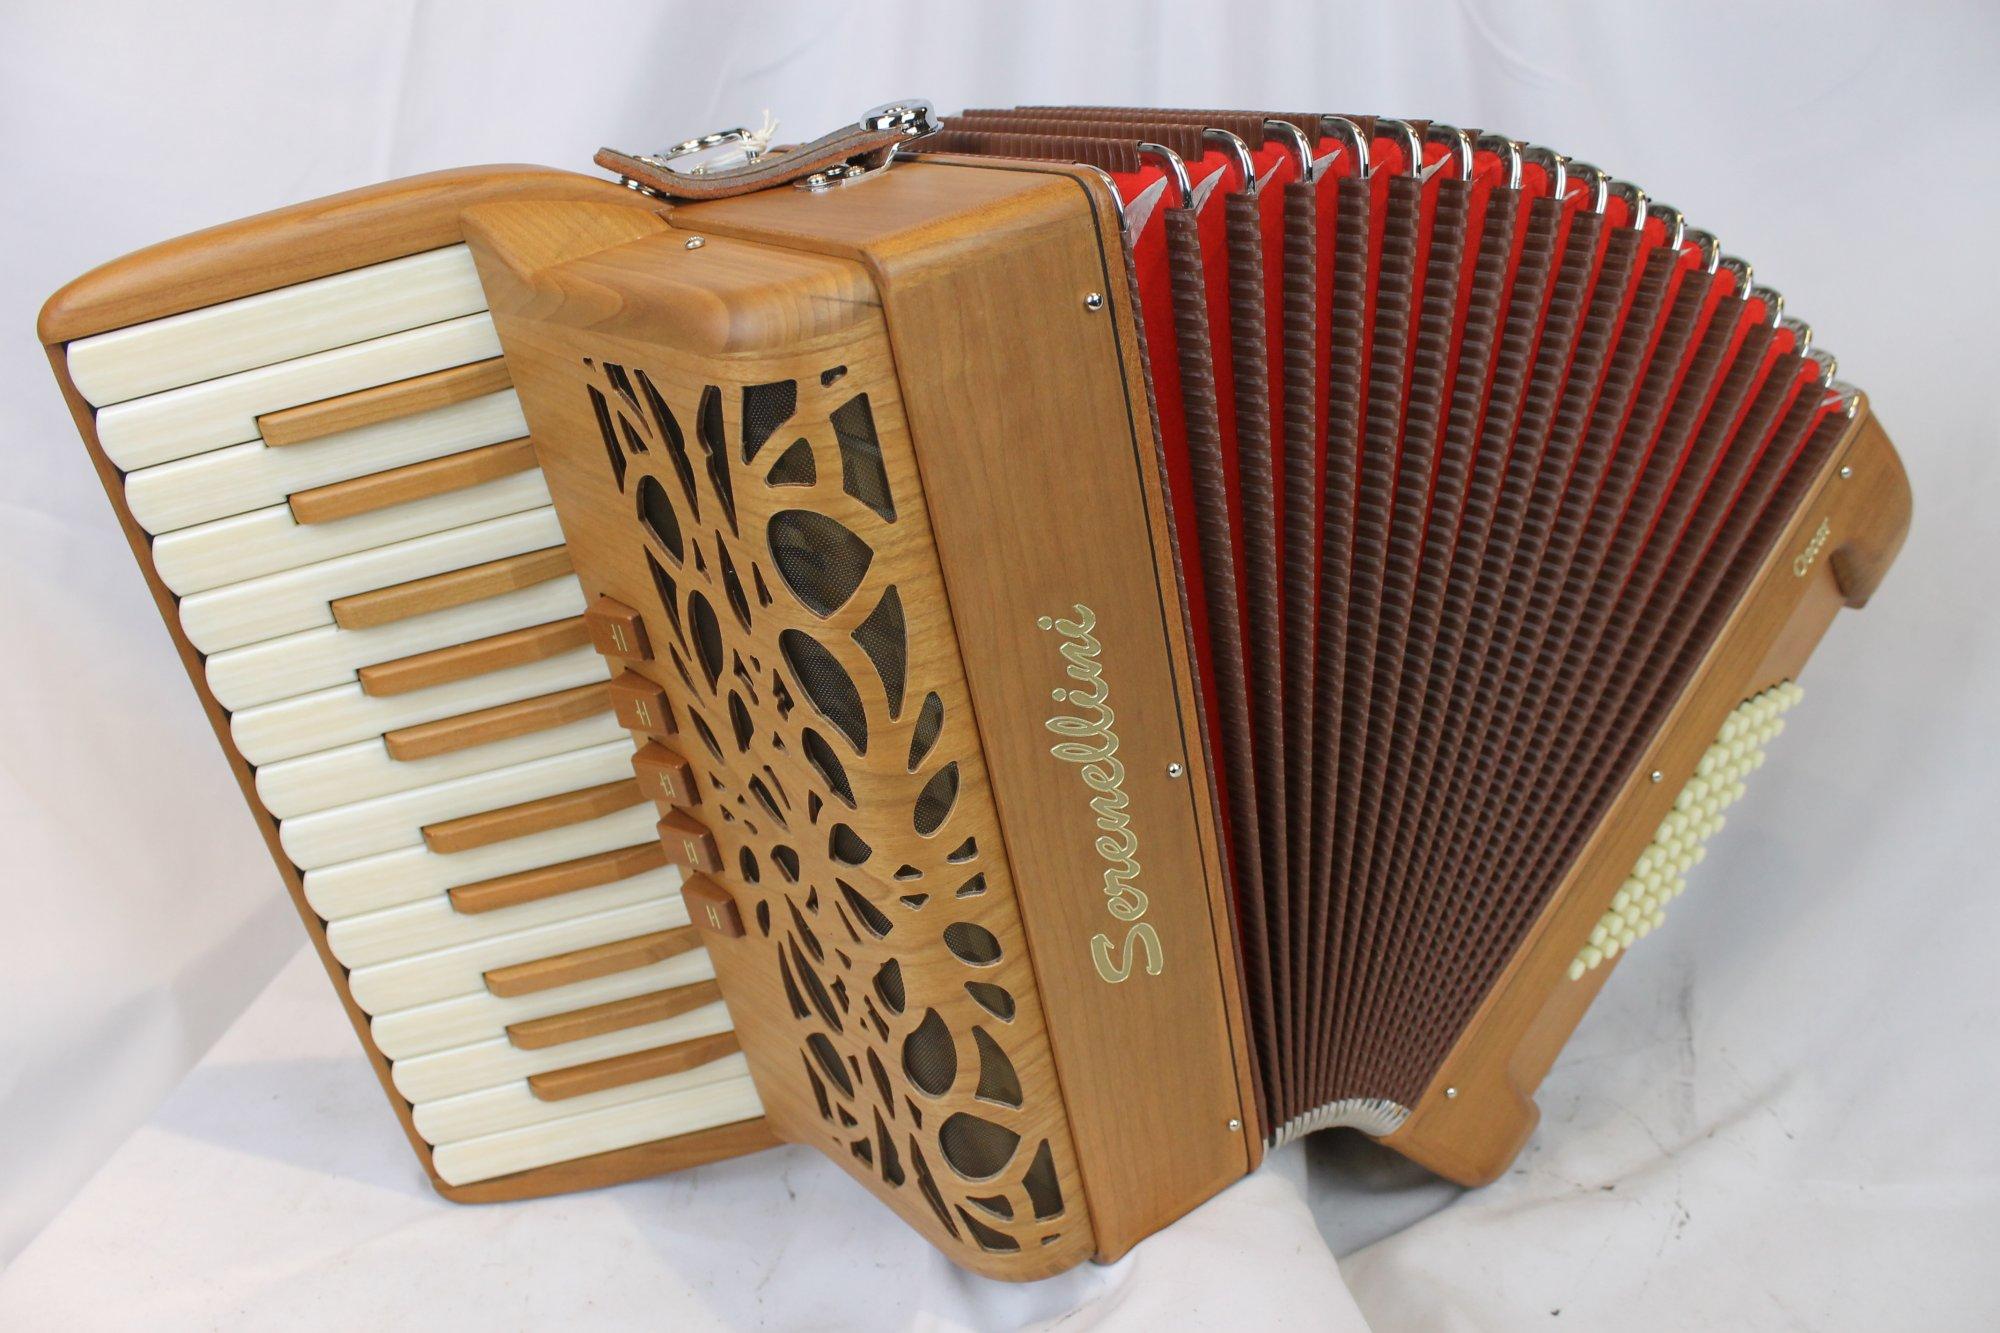 NEW Cherry Serenellini Oscar Piano Accordion LMM 26 48